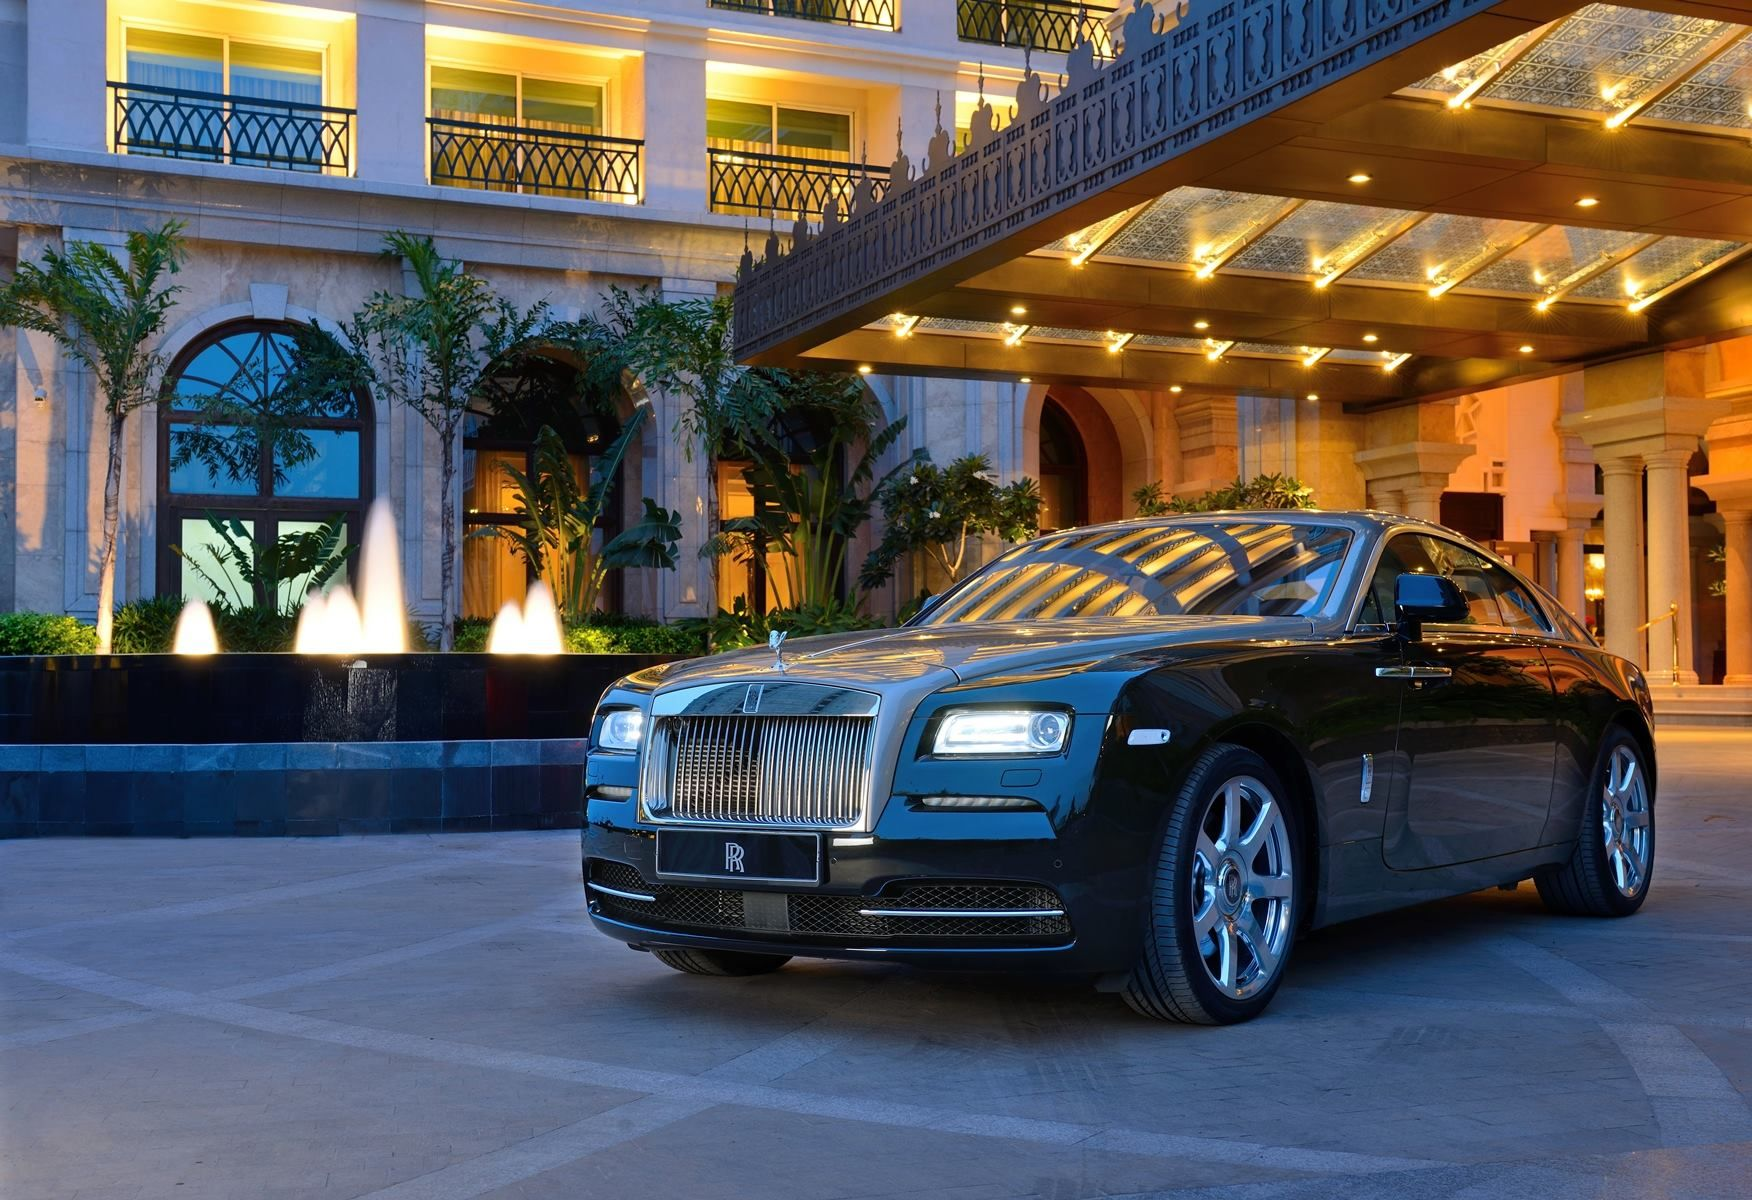 Rolls Royce India_ smart looking Rolls royce, Rolls